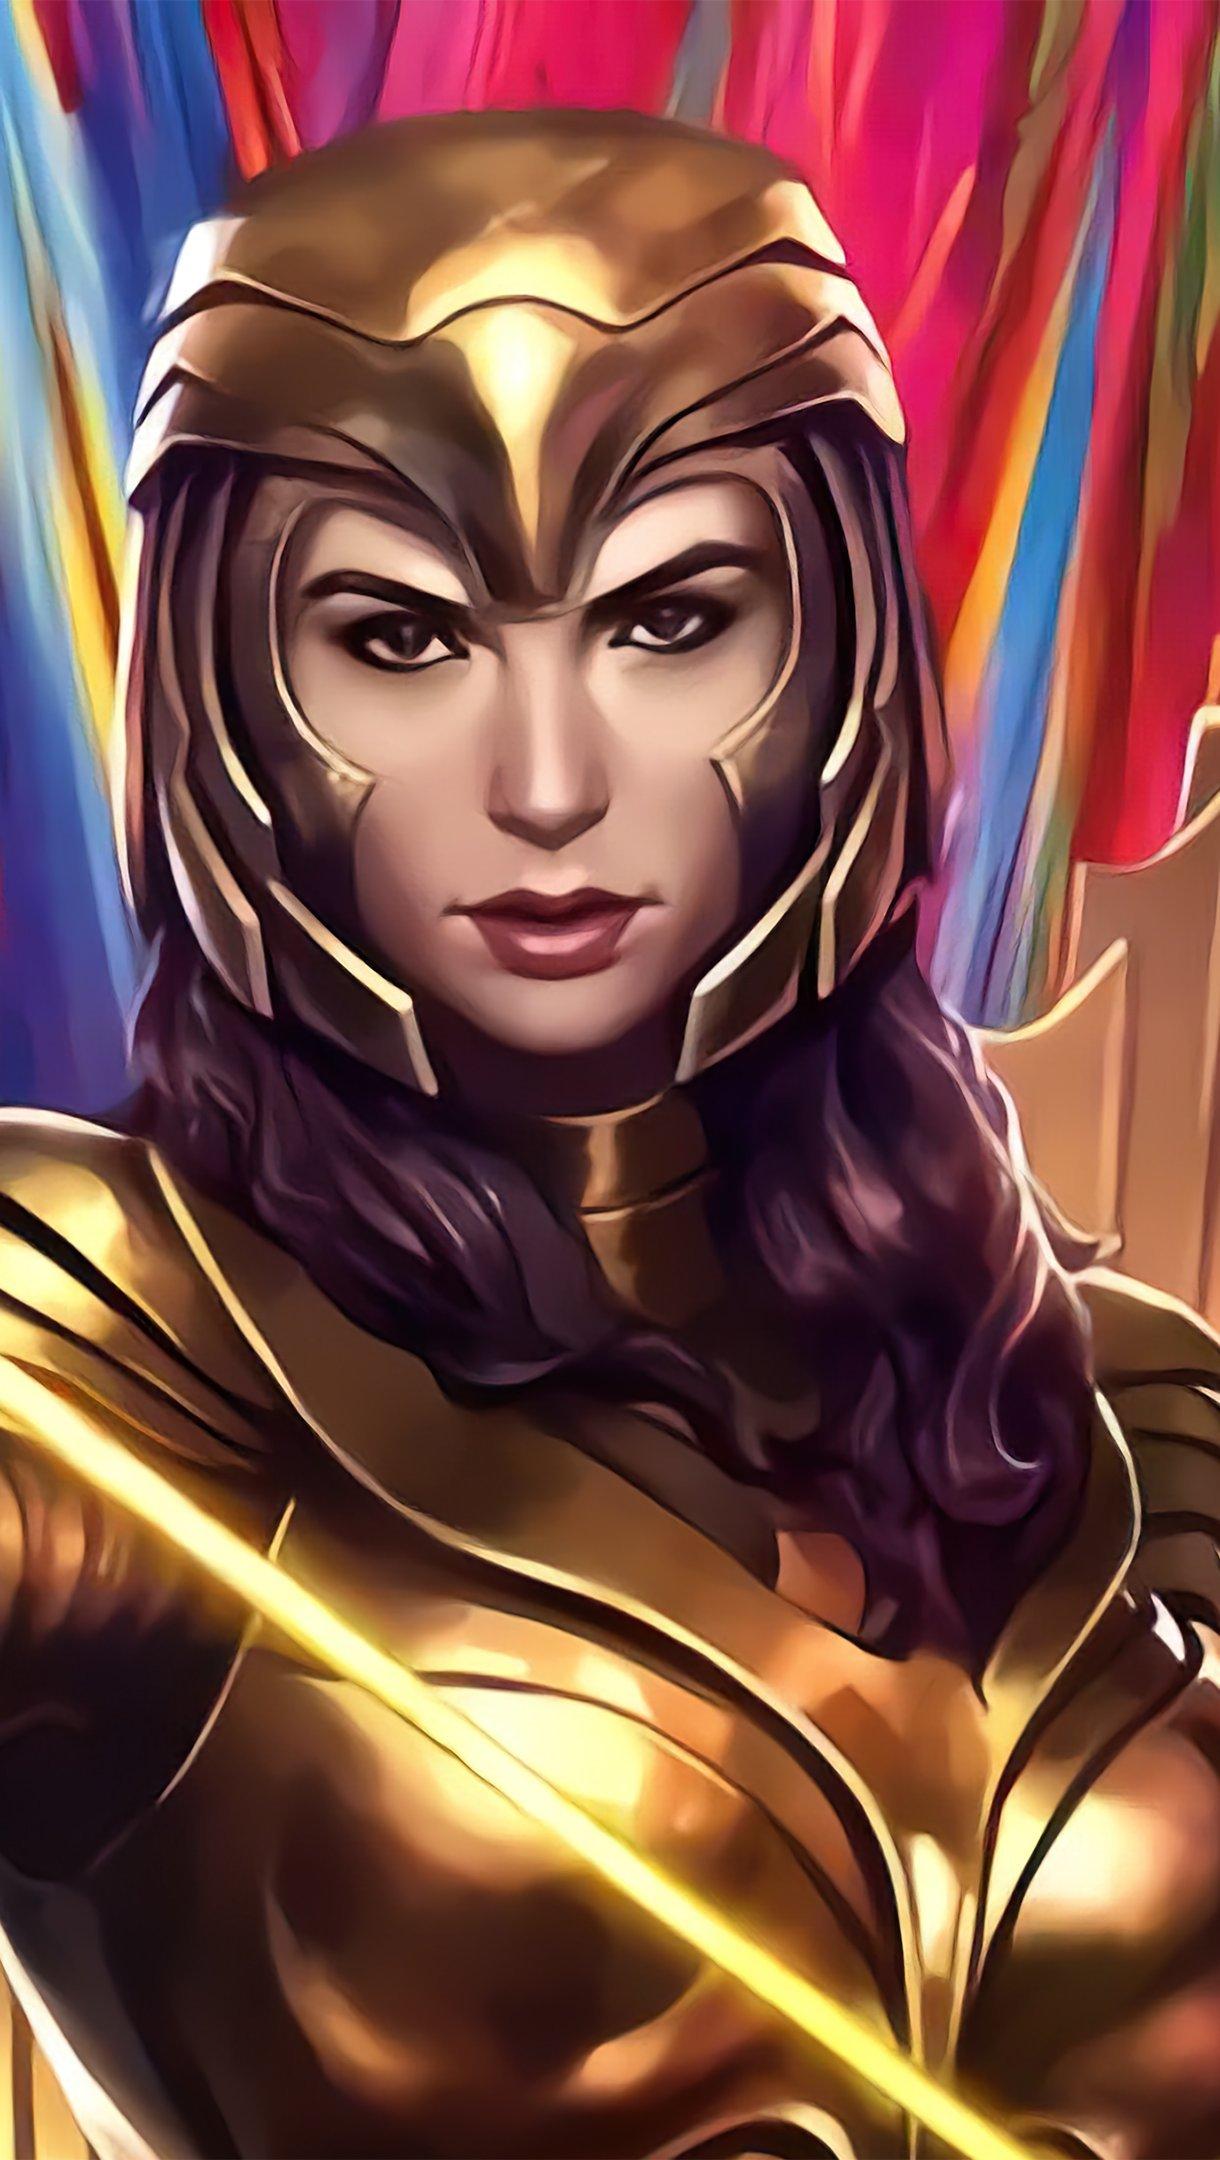 Wallpaper Injustice Wonder Woman Gold suit Vertical